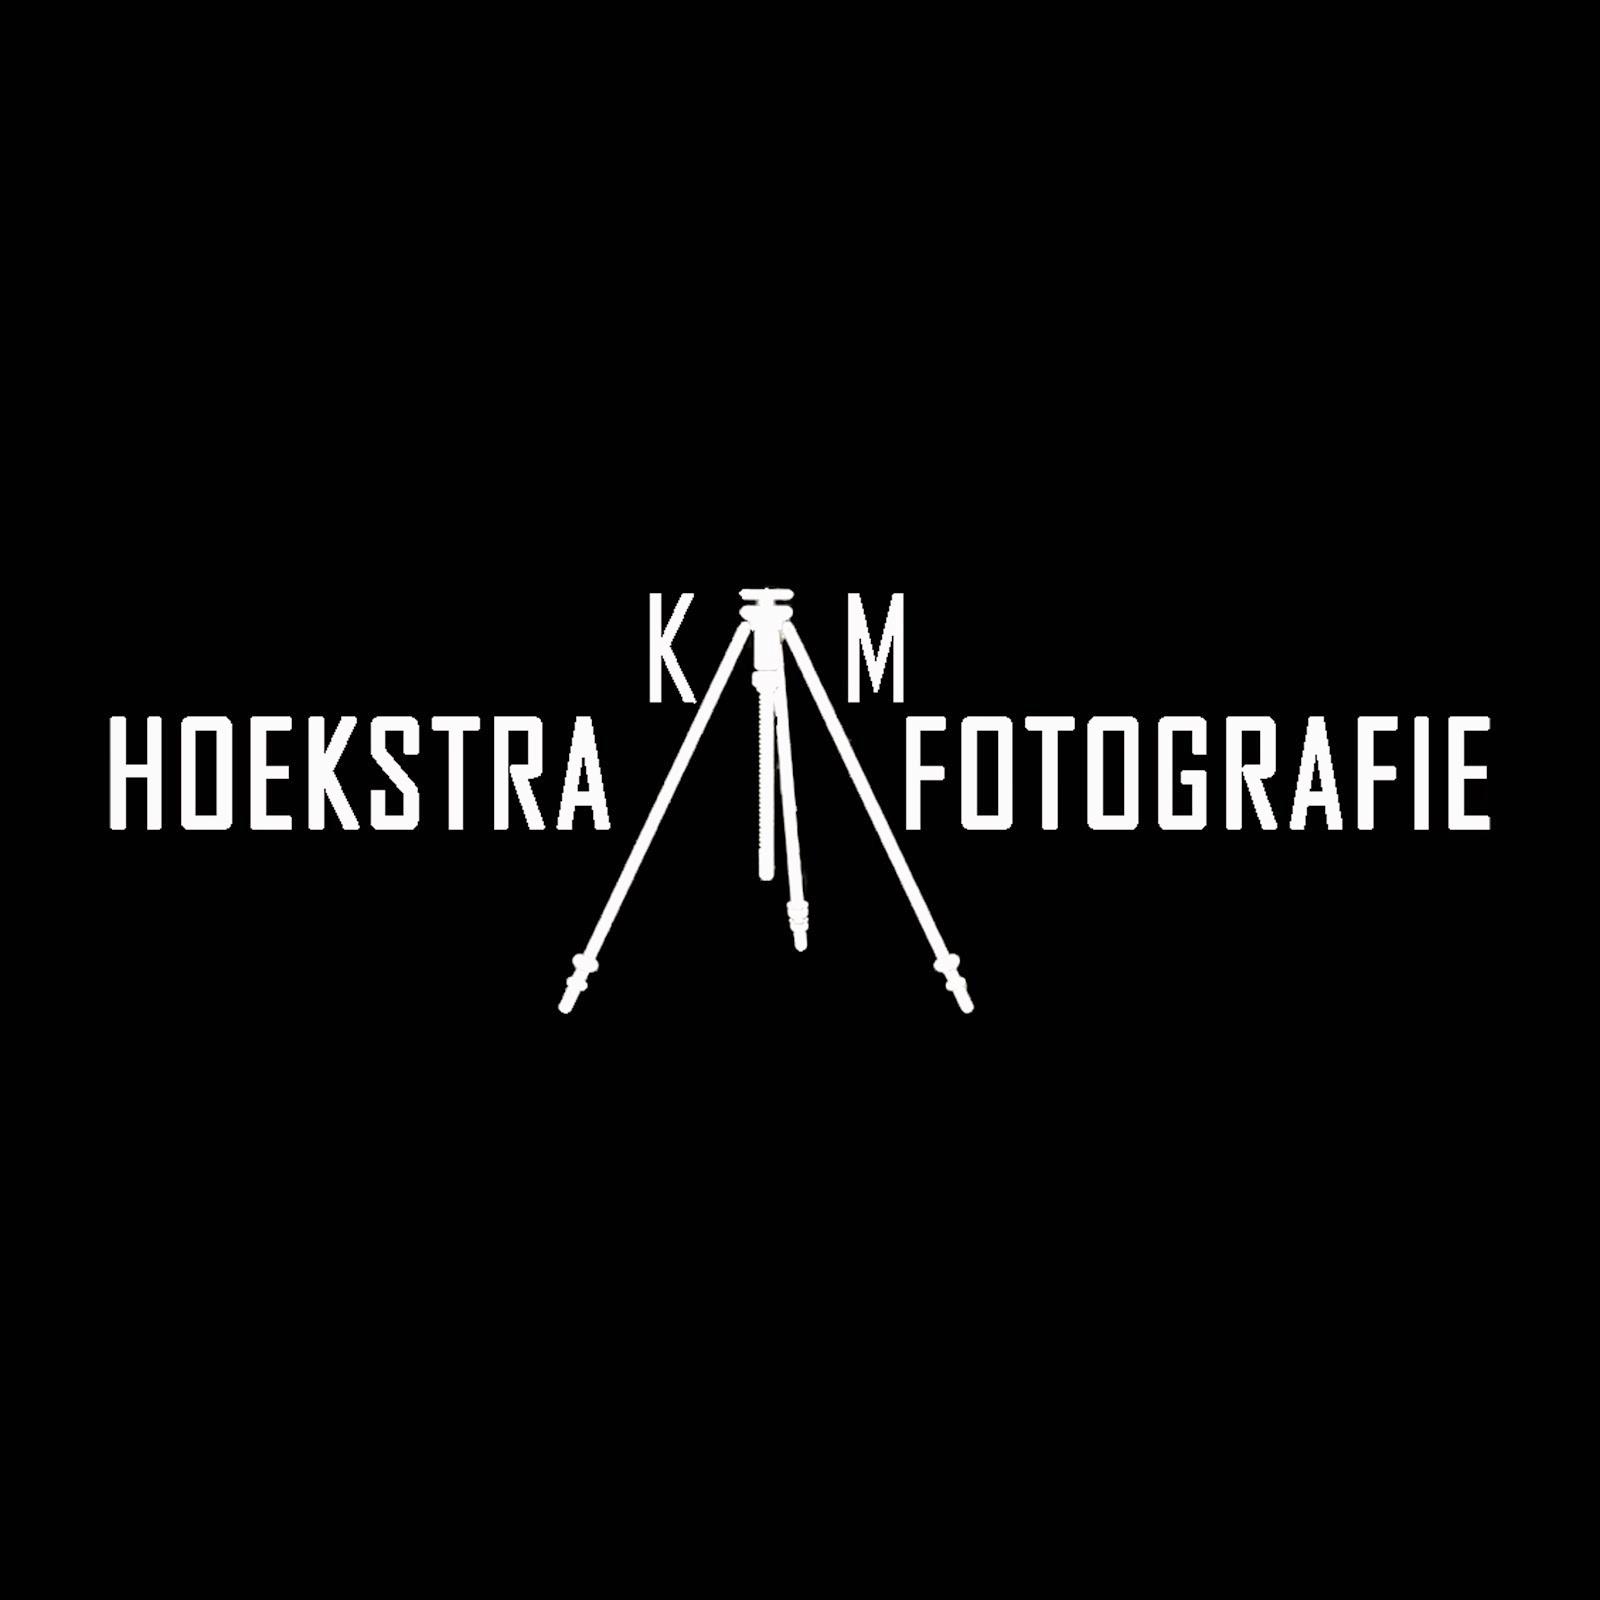 Kim Hoekstra Fotografie